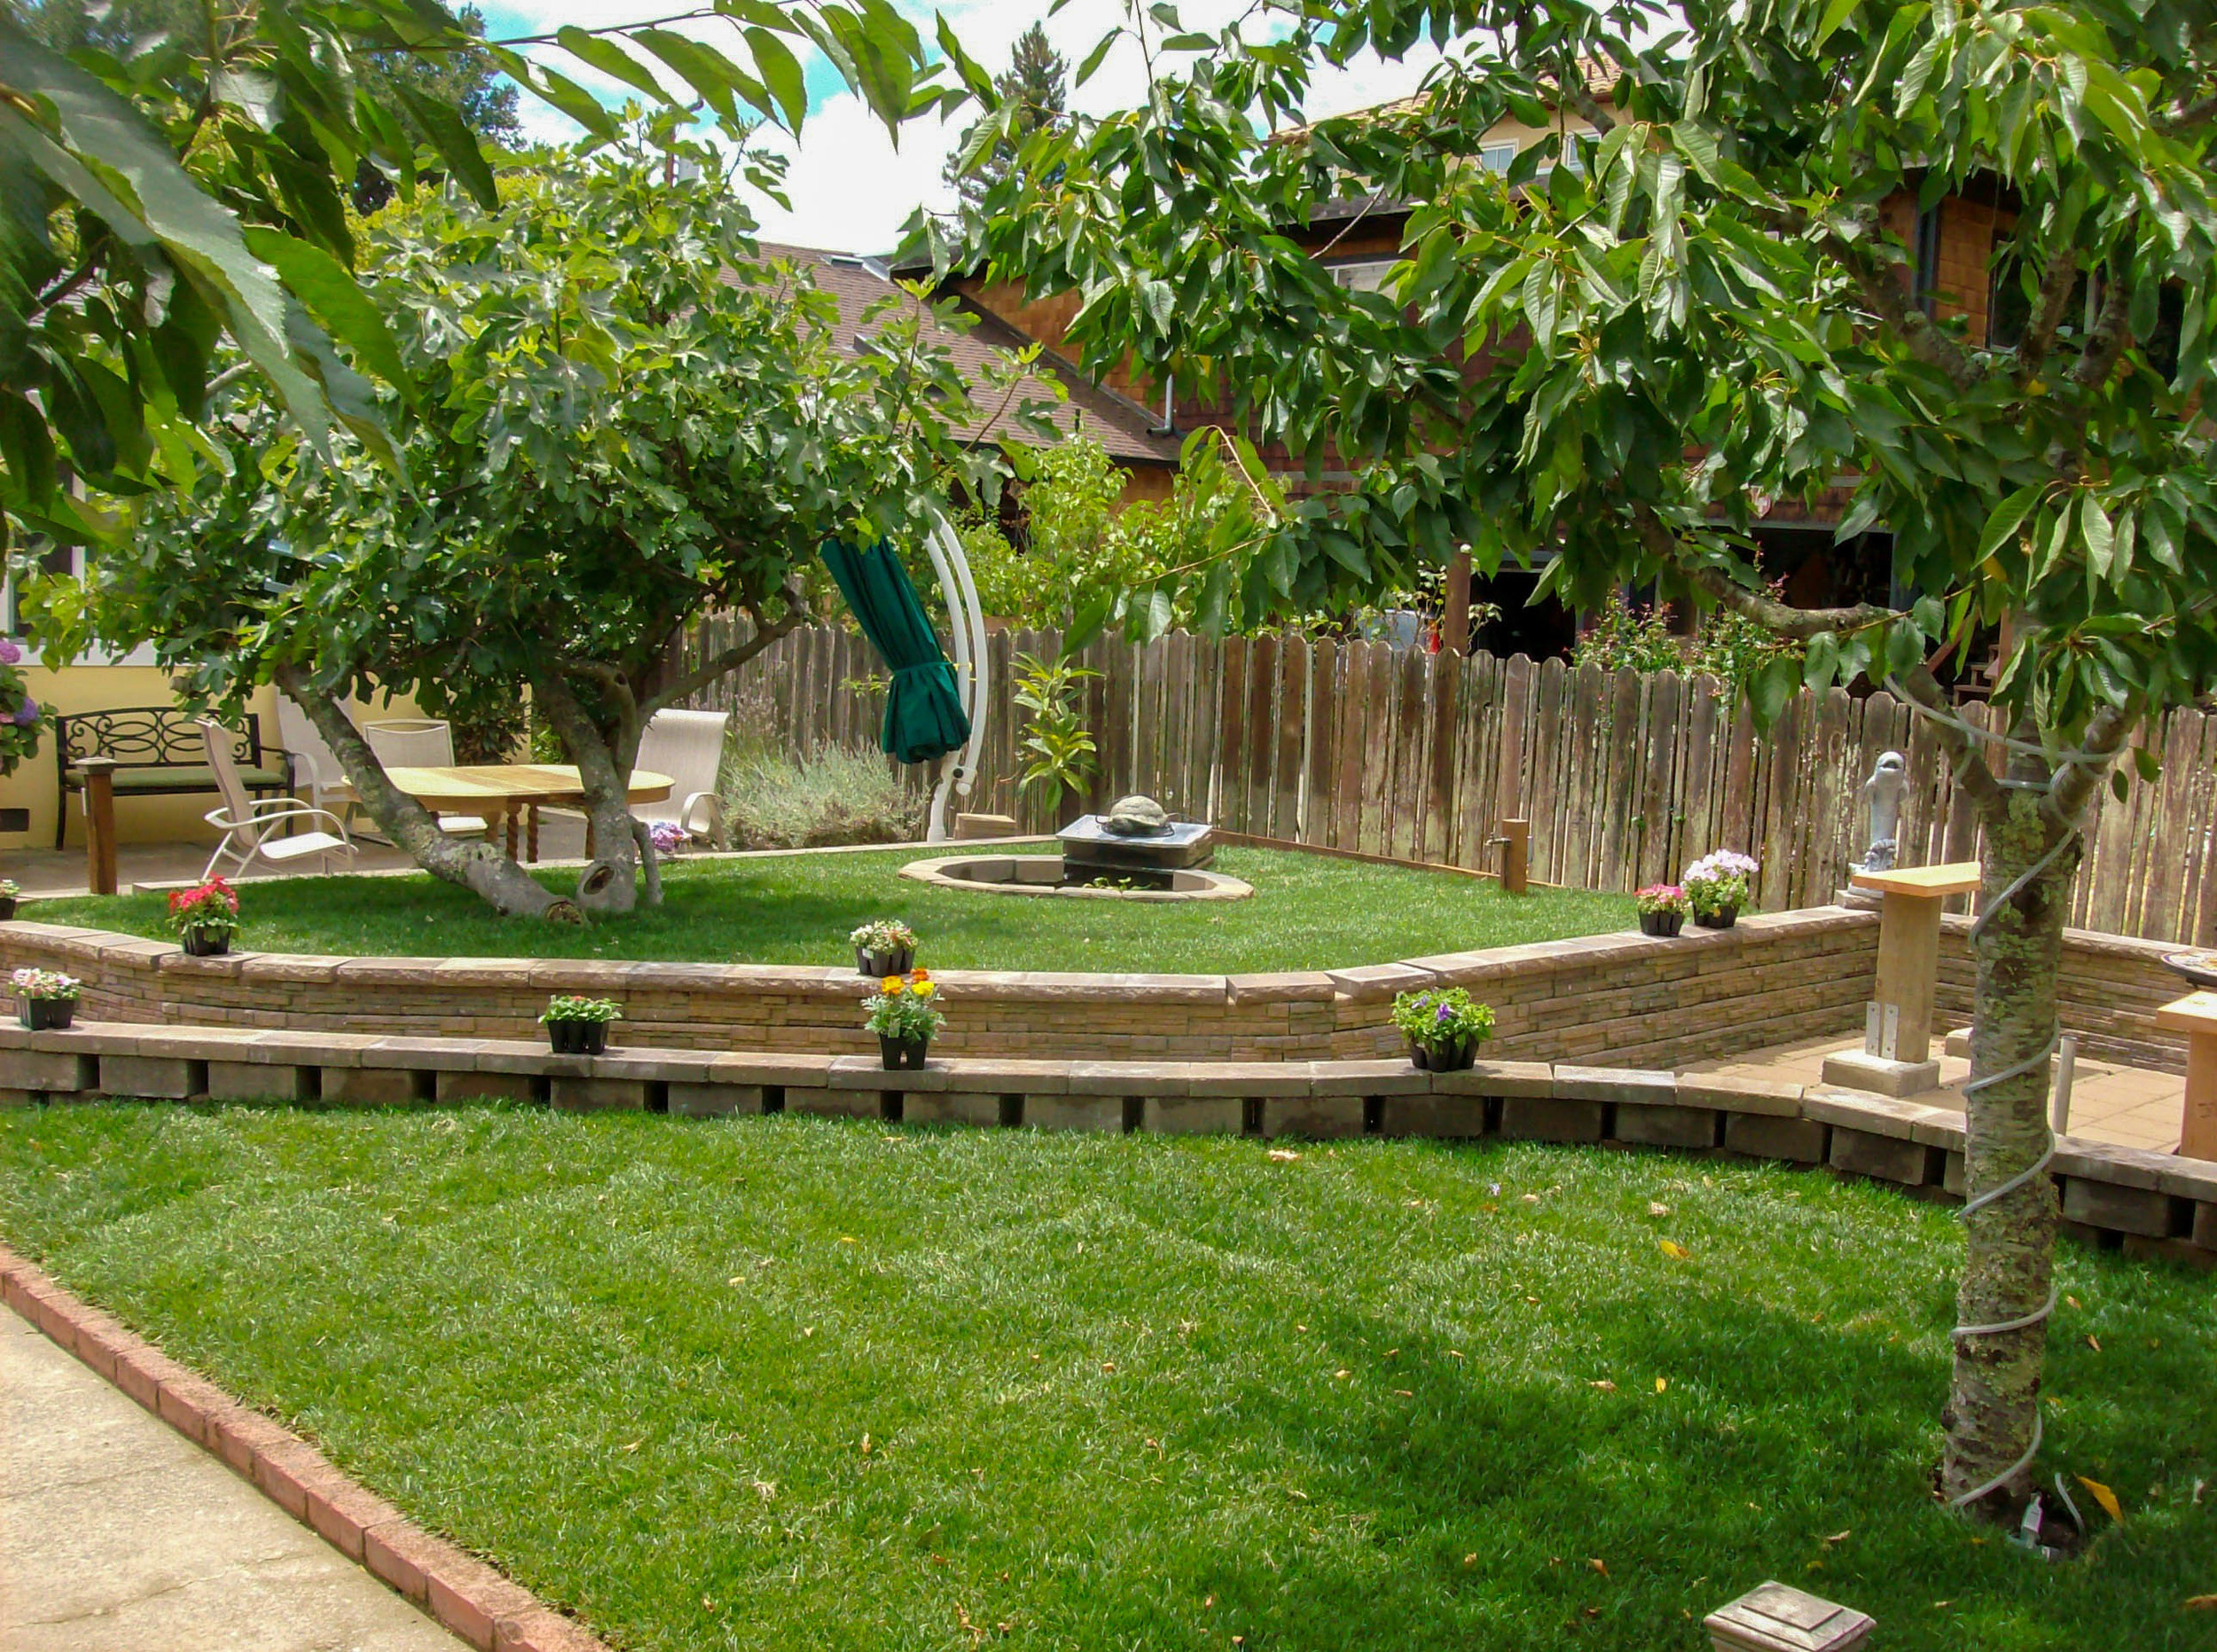 Lawn install and stone wall - Francisco's Gardening & Maintenance www.fgandm.com .jpg